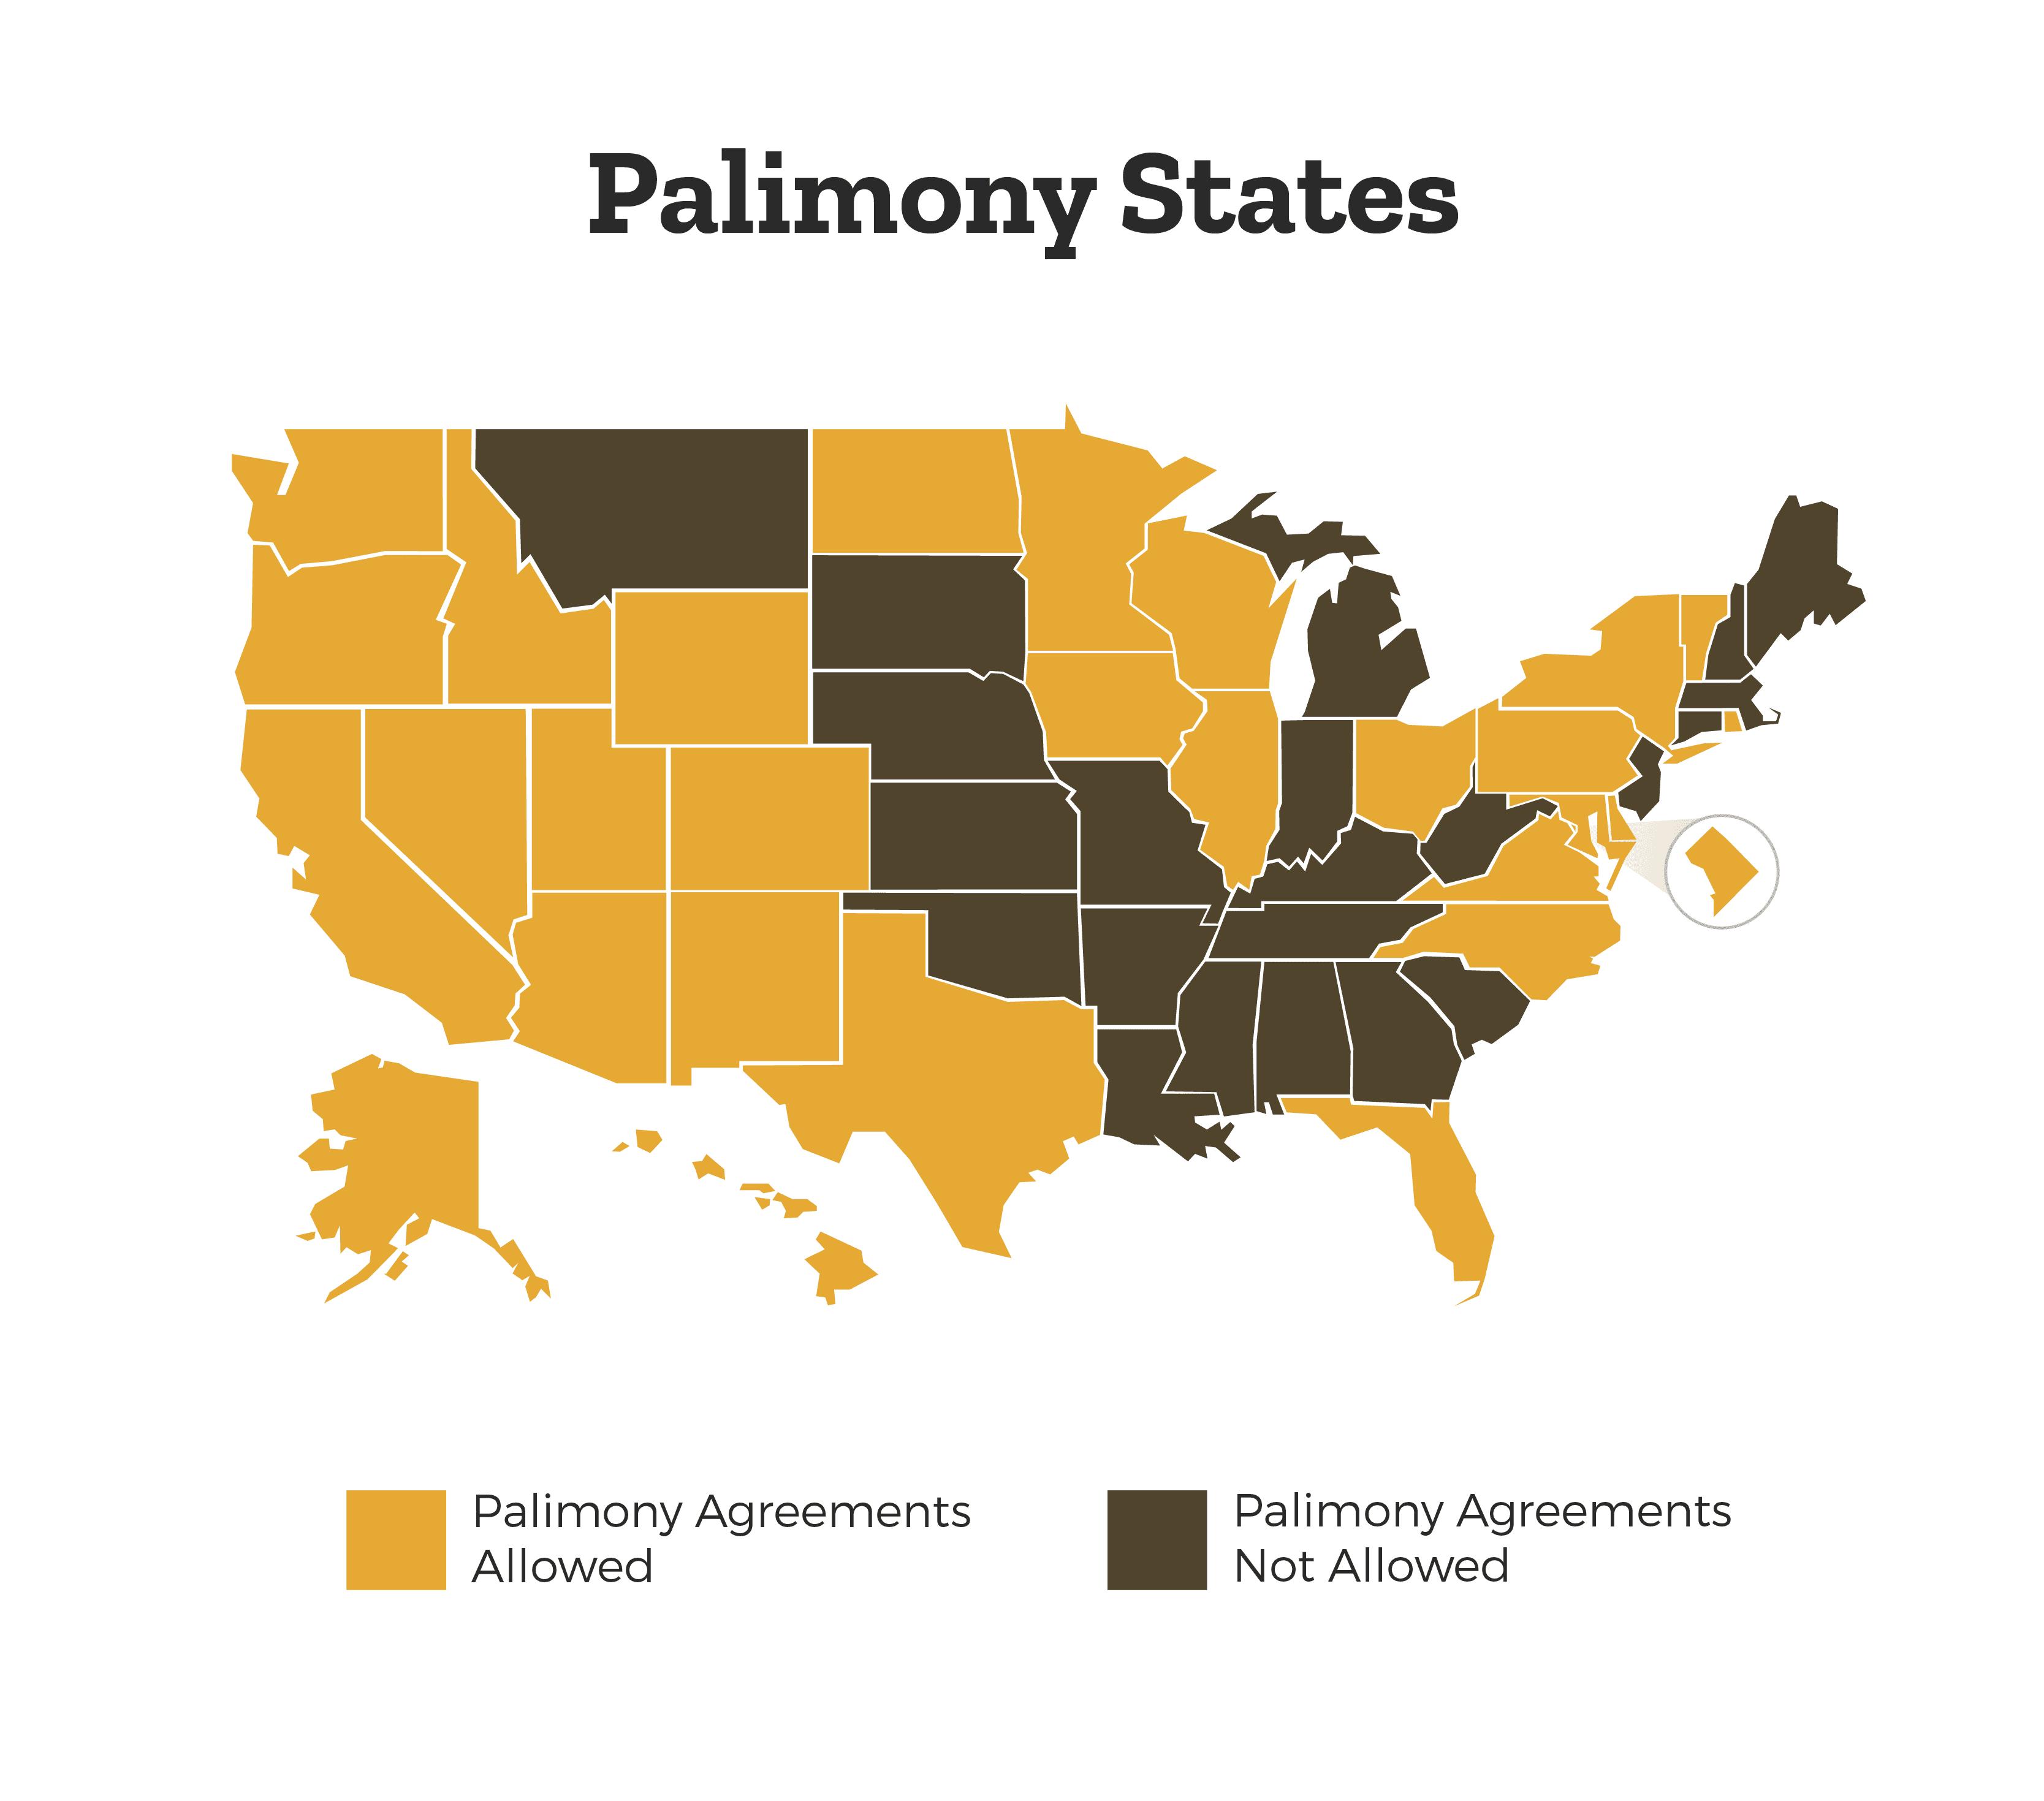 palimony-states